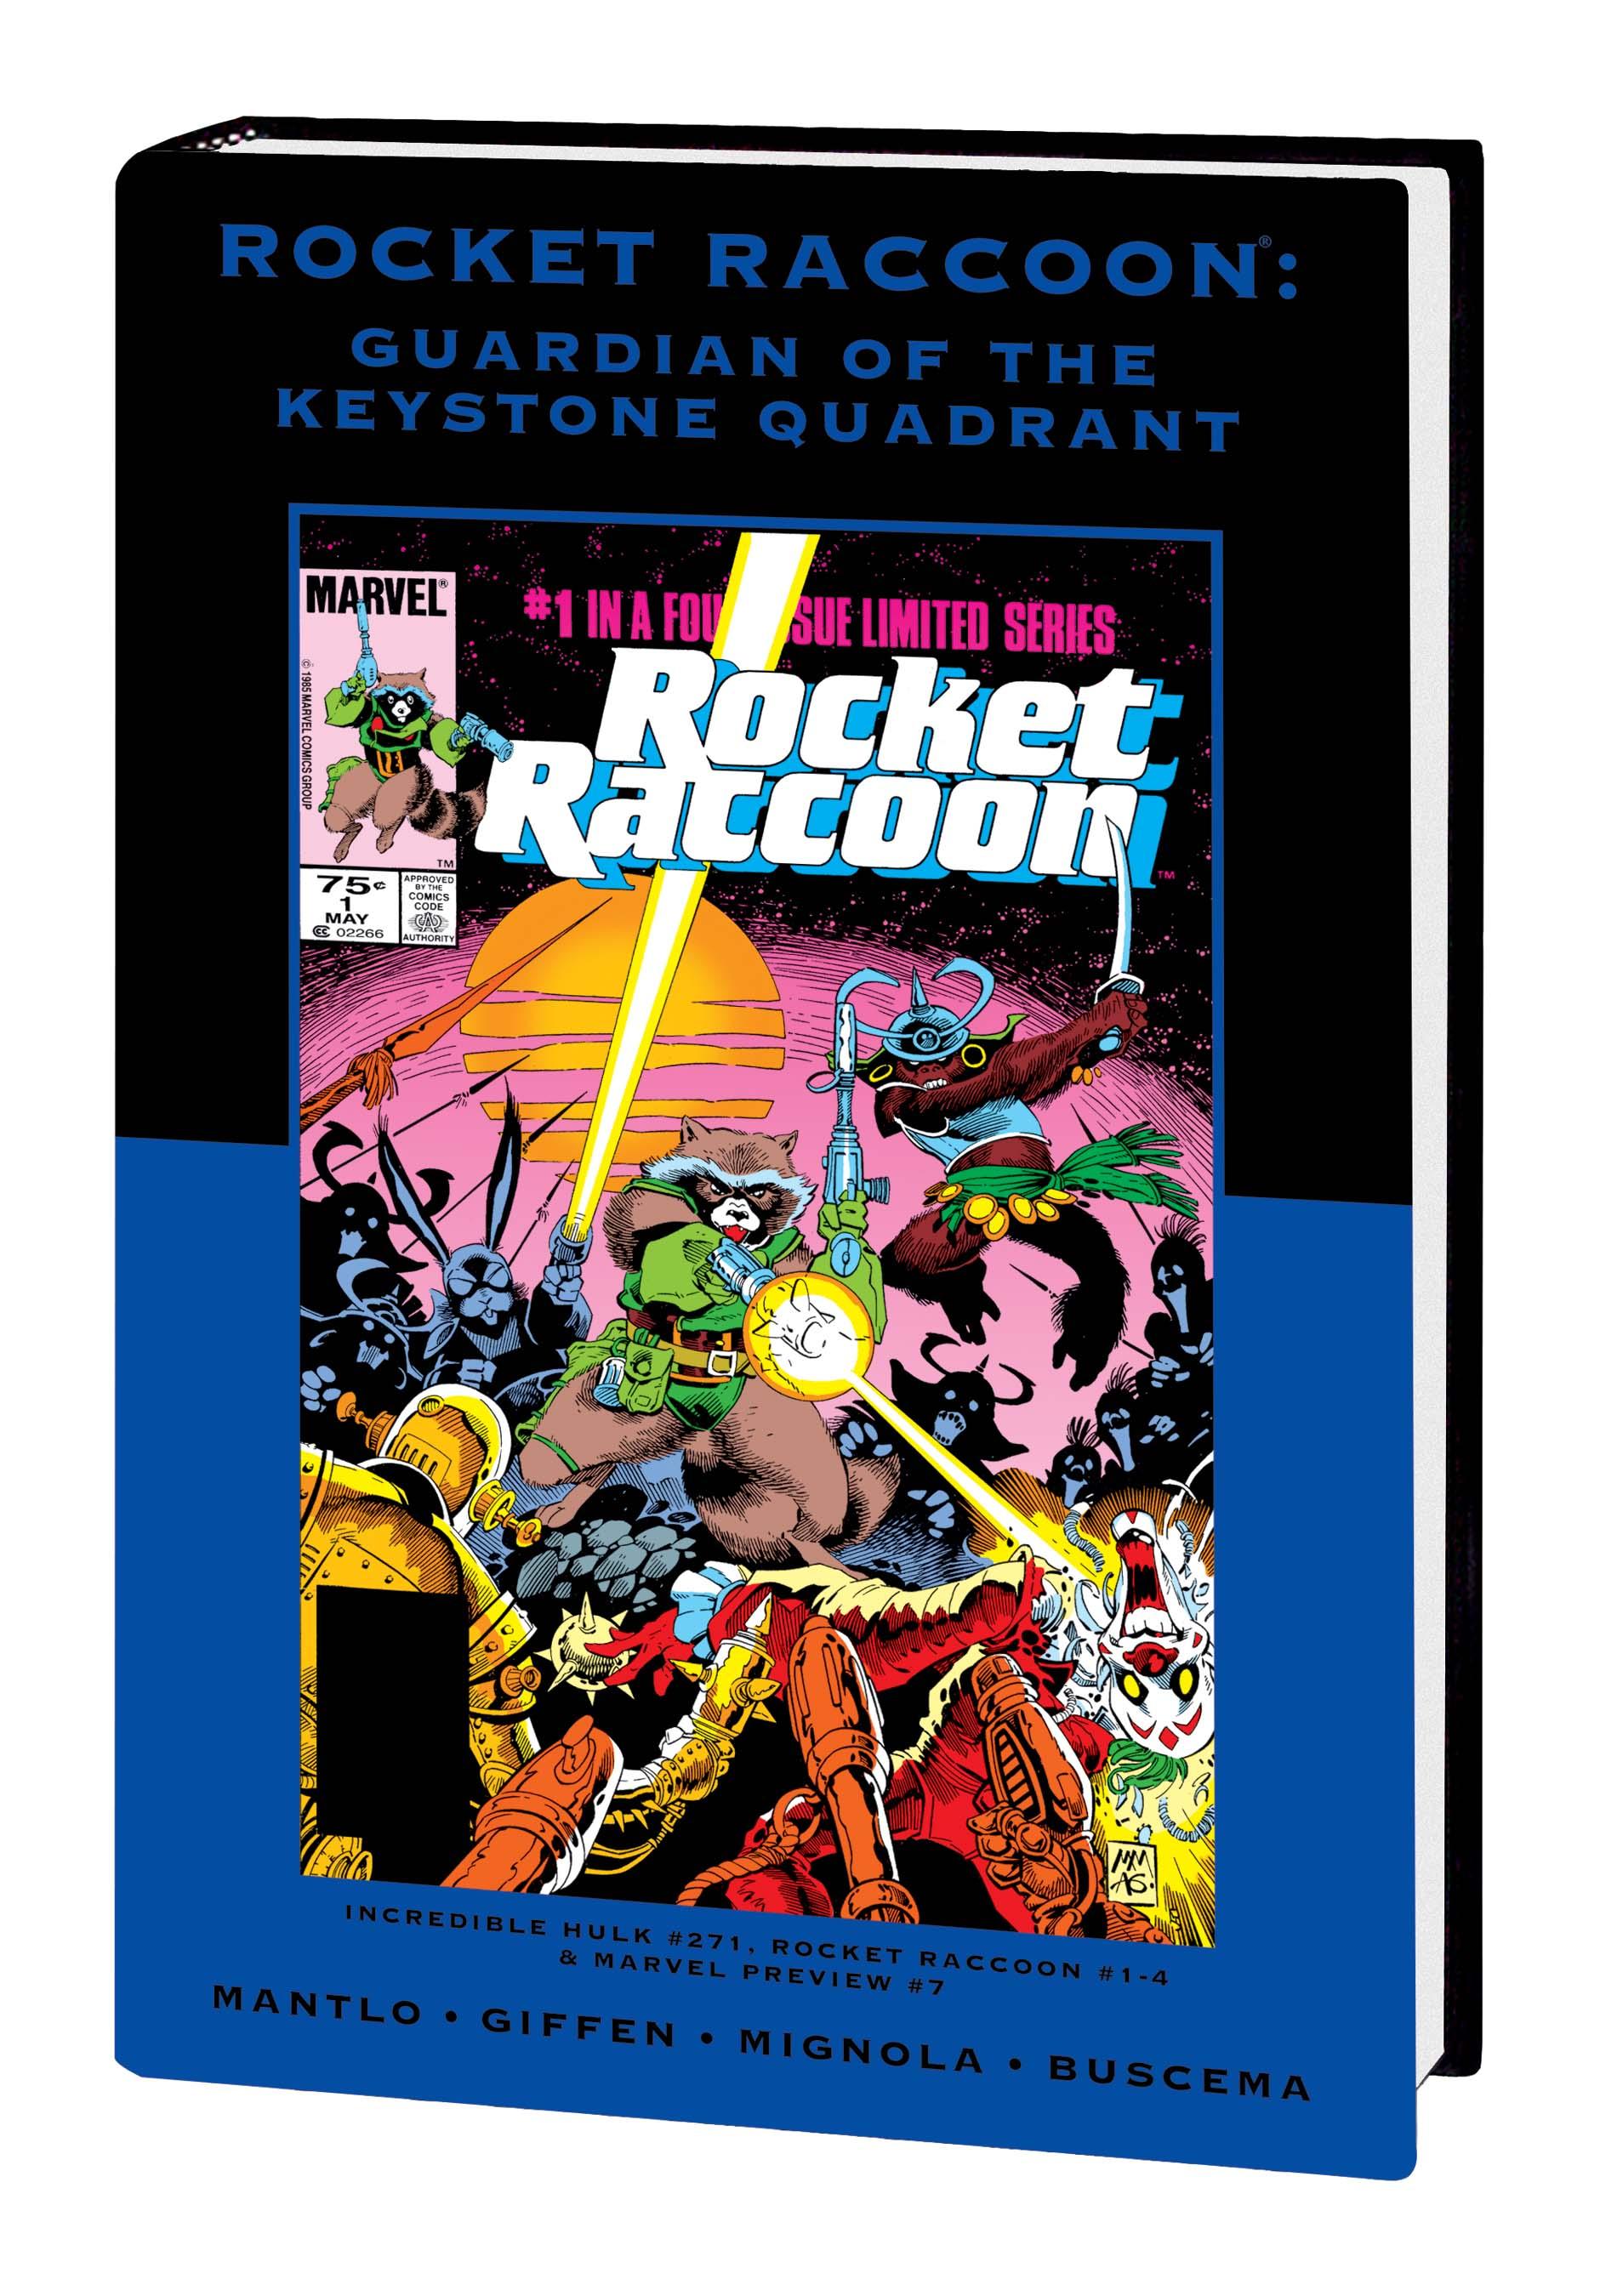 ROCKET RACCOON: GUARDIAN OF THE KEYSTONE QUADRANT PREMIERE HC (Hardcover)